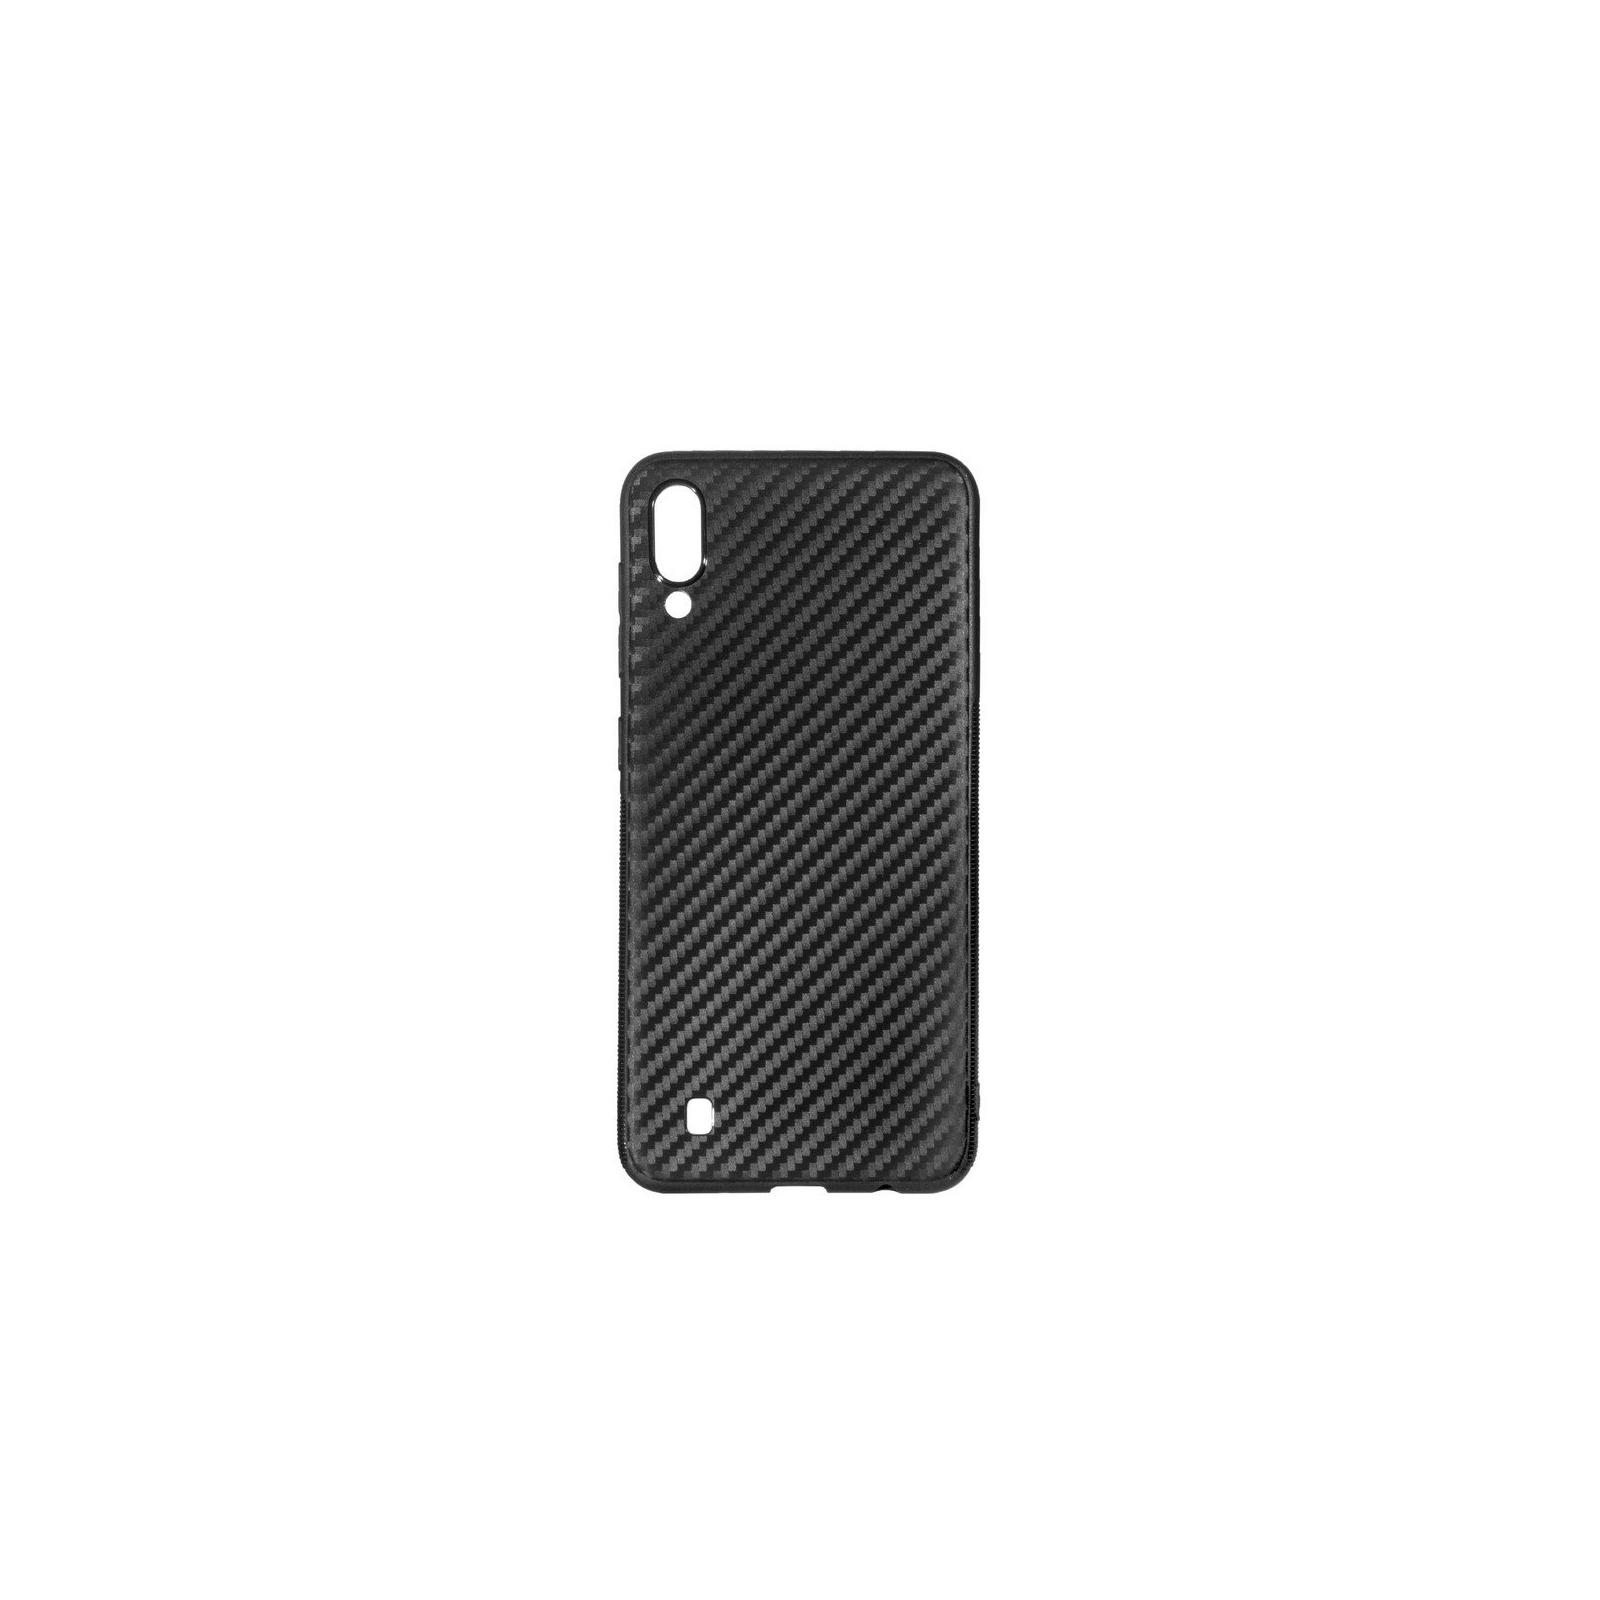 Чехол для моб. телефона ColorWay ColorWay TPU Сarbon для Samsung Galaxy M10 Black (CW-CTCBSGM105-BK)